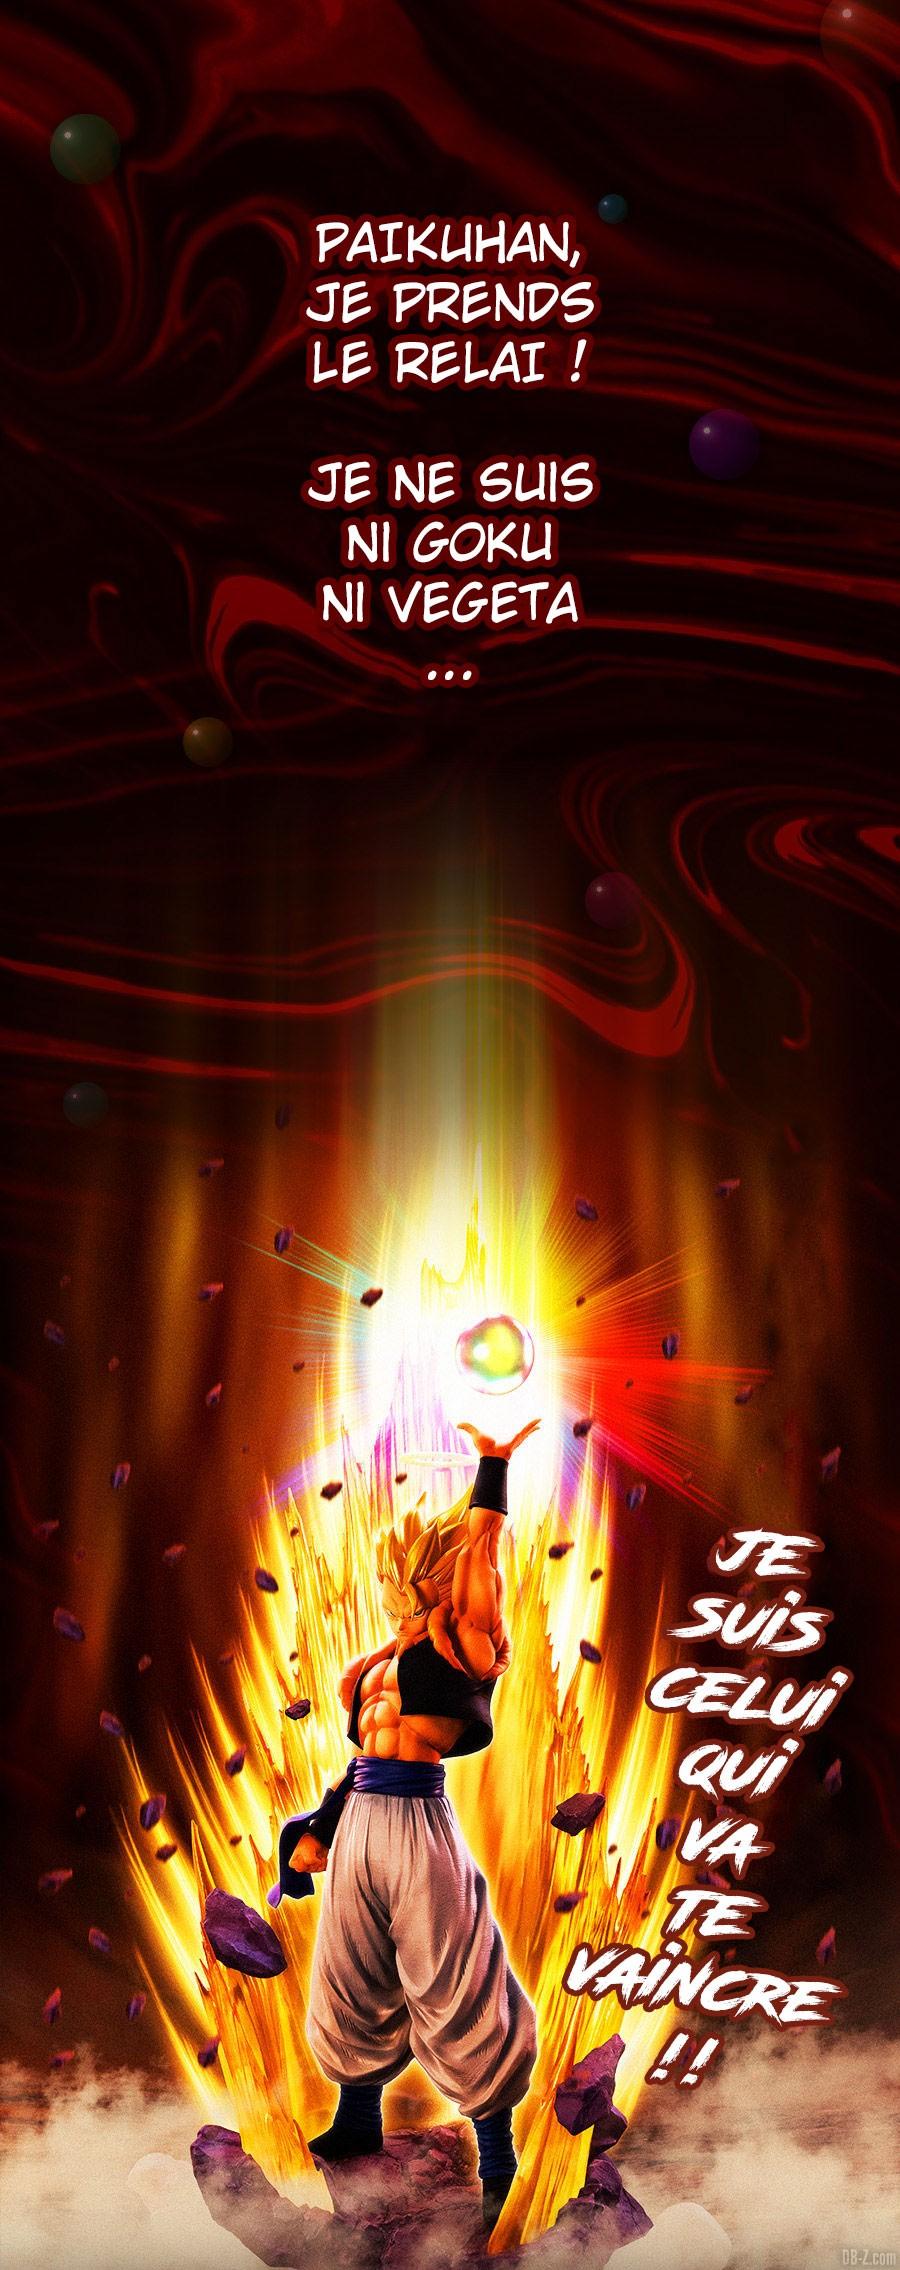 Promo Figuarts Zero Extra Battle Super Saiyan Gogeta Fusion Reborn